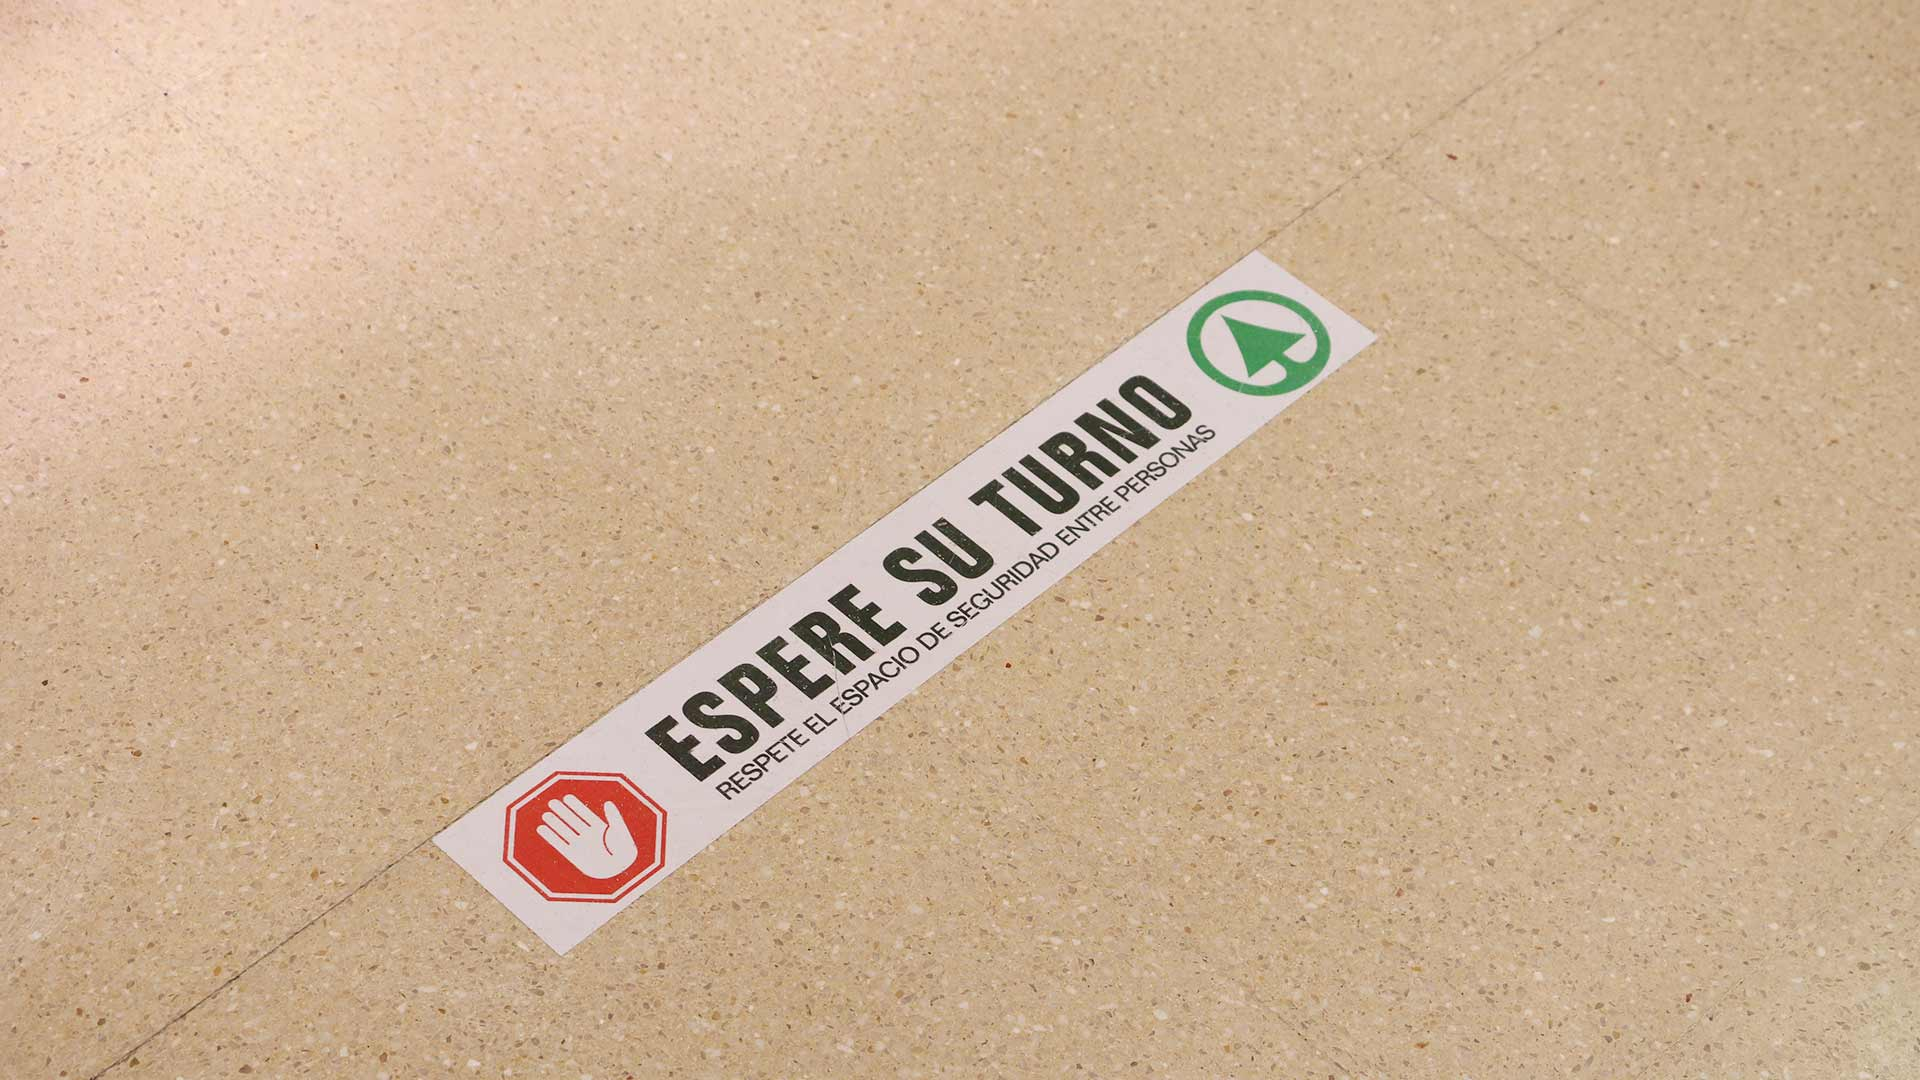 pujol-paviments-terratzo-interior-fragadis-spar-5